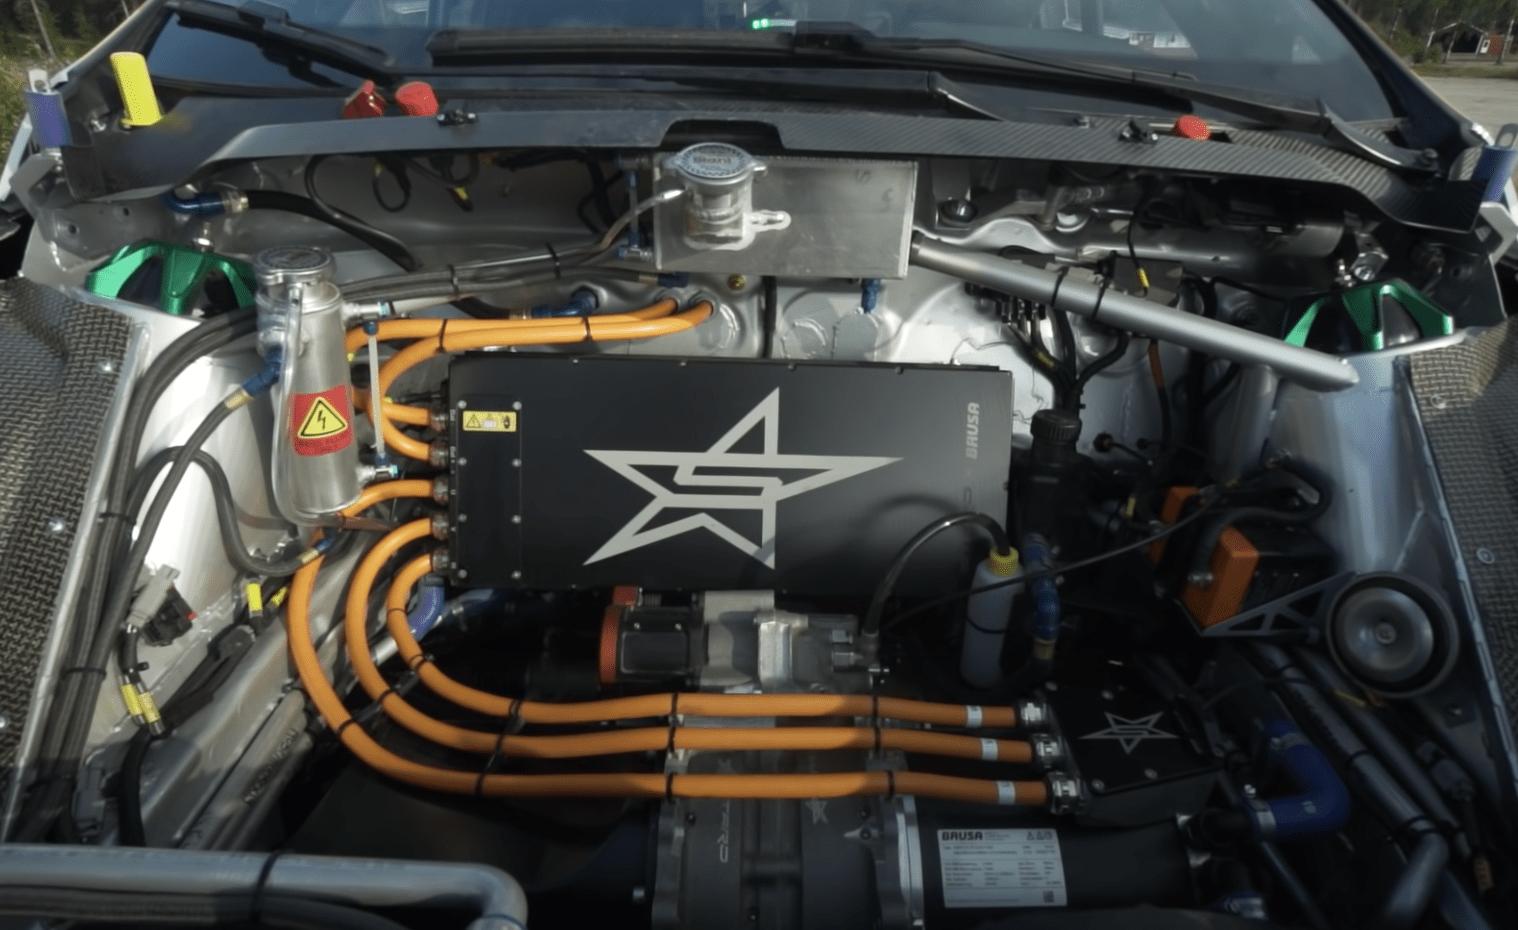 hood, motor, power, car, future, ev